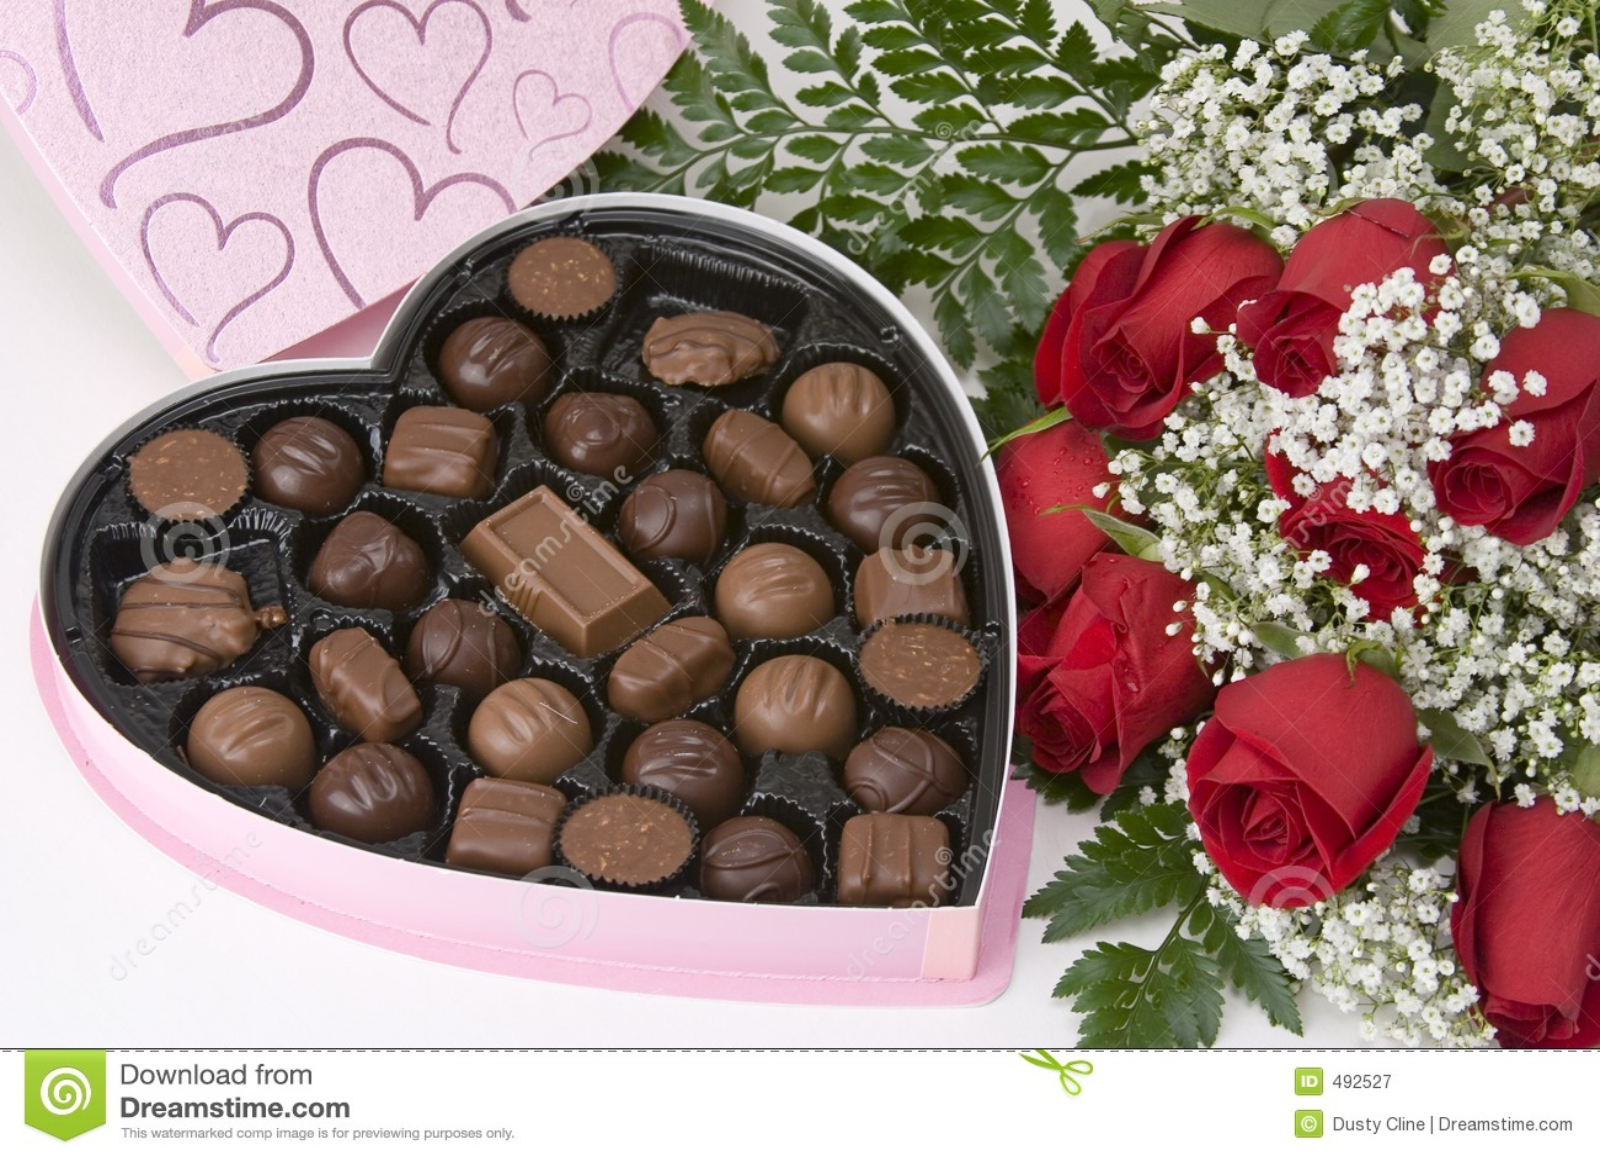 Chocolates n Roses